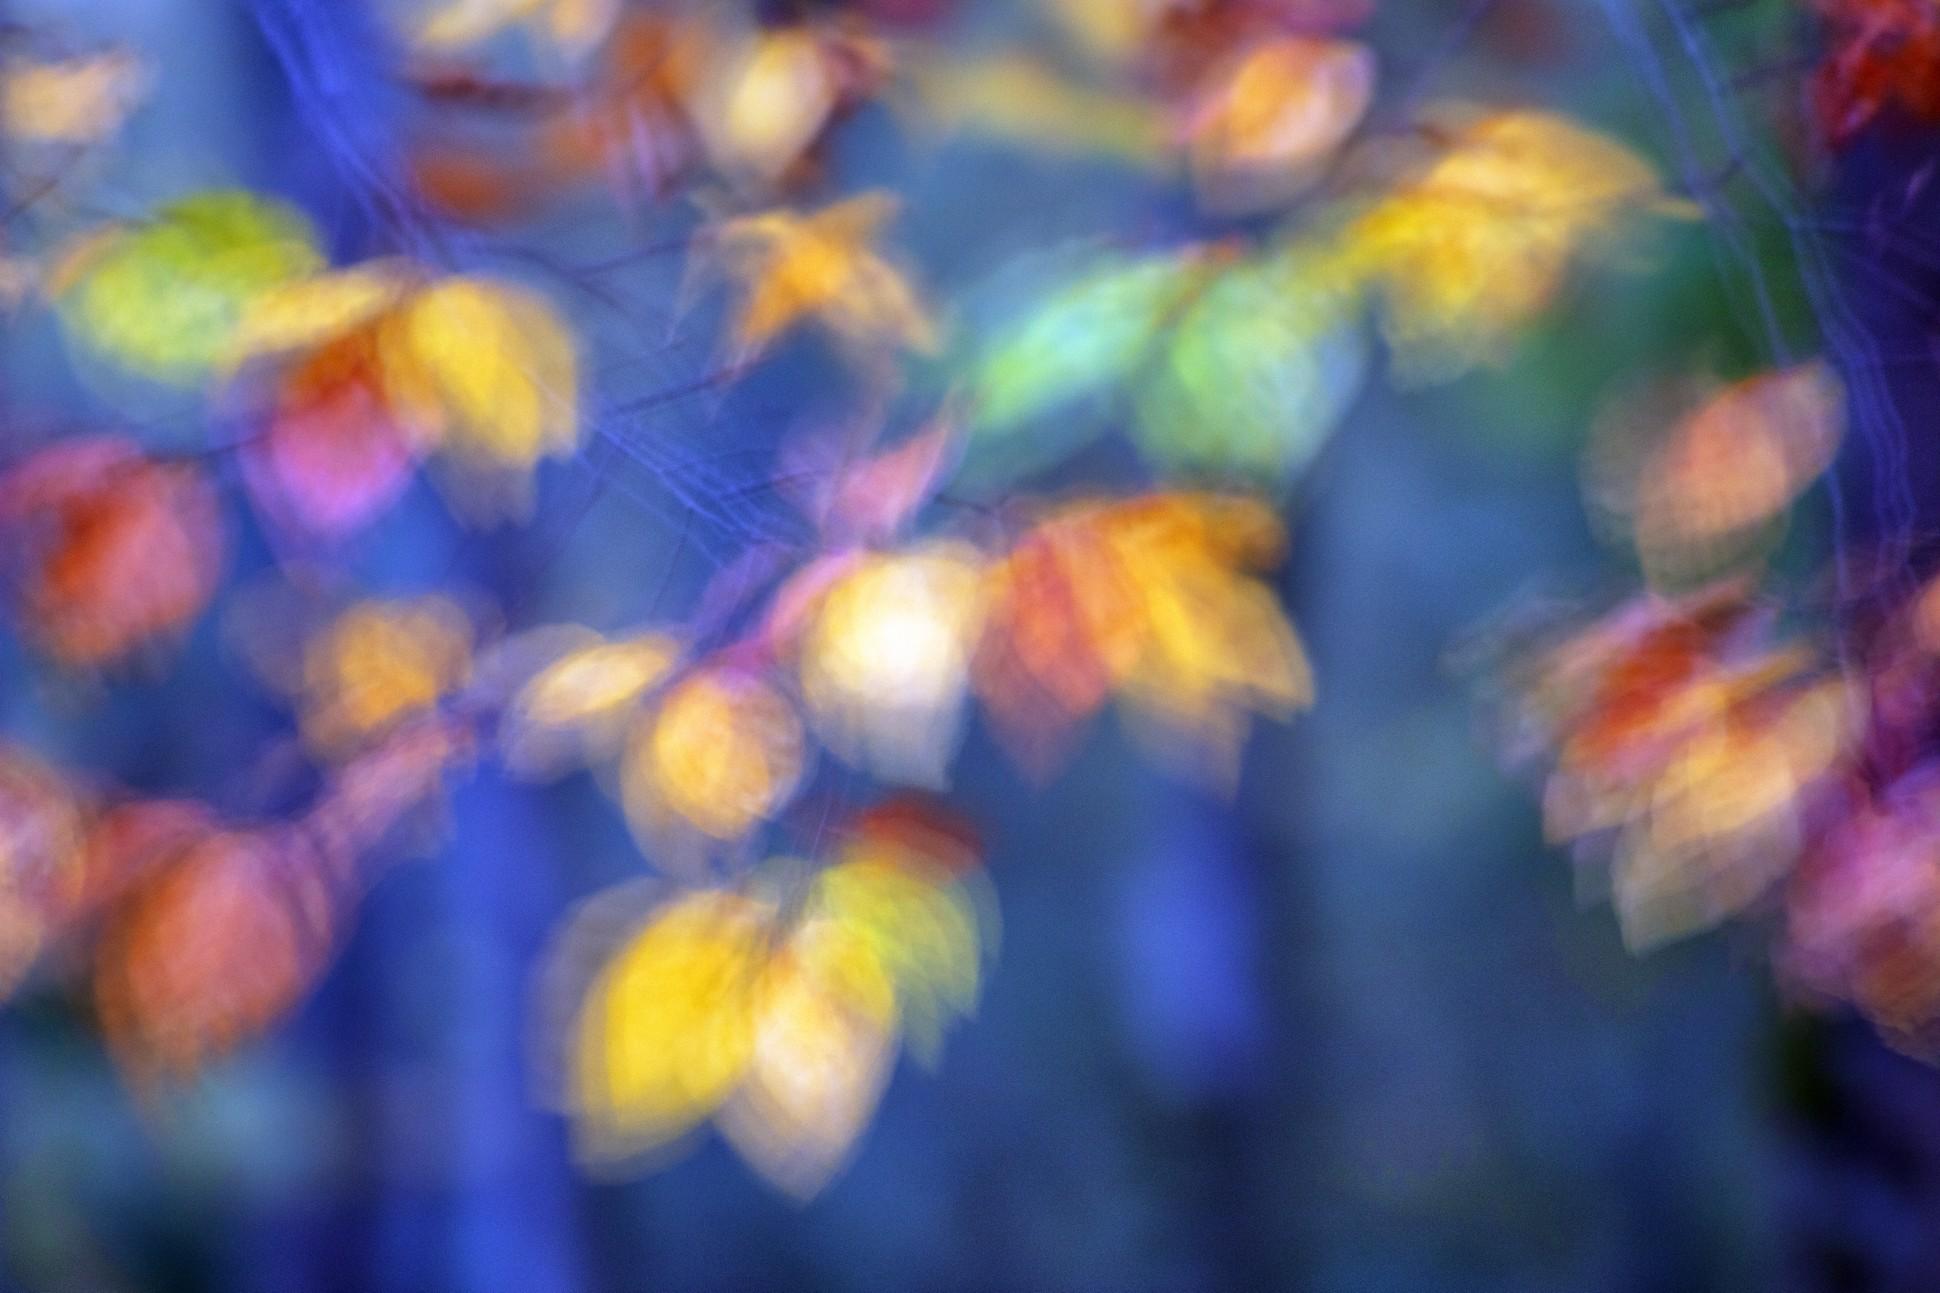 IMPRESSIONNISME - David Santiago, Landscape Photography